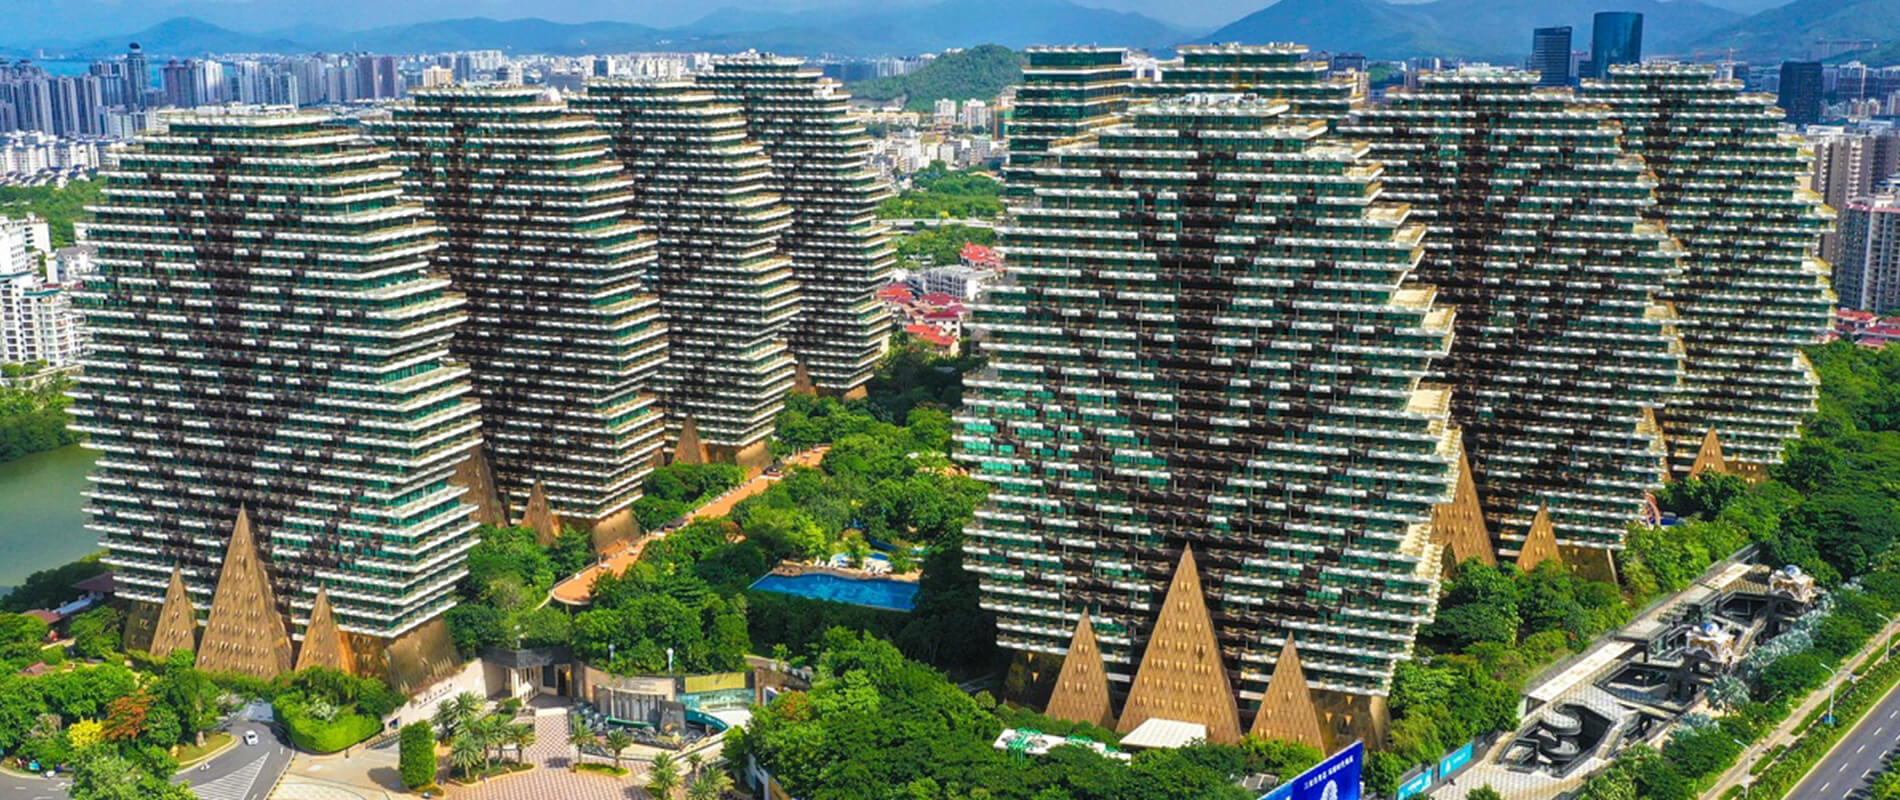 Sanya Beauty Crown Hotel, la foresta urbana dell'isola di Hainan